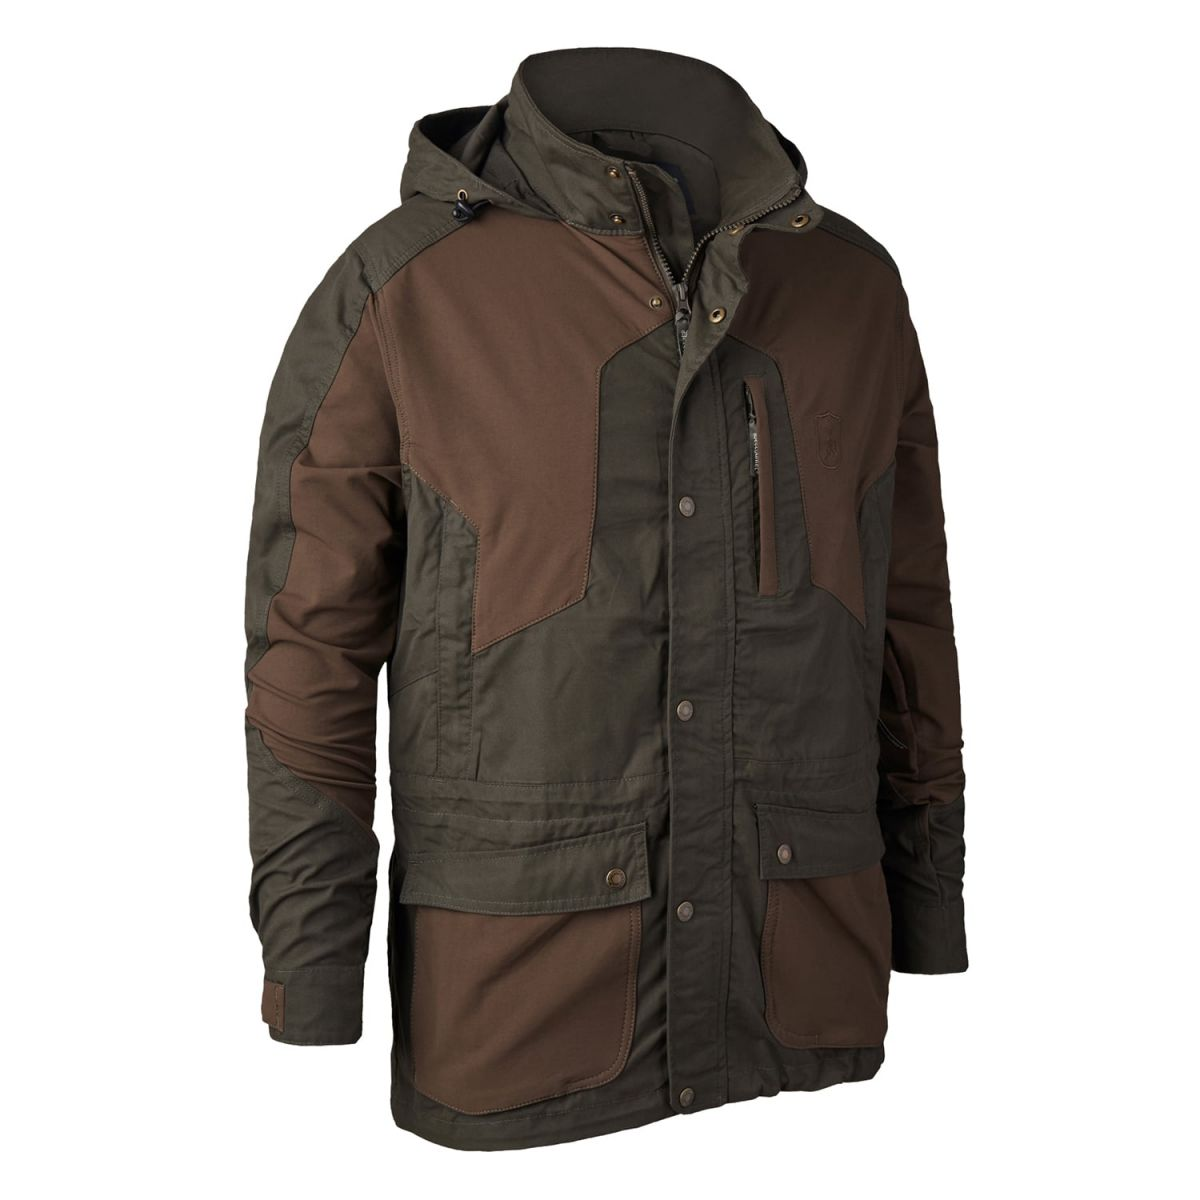 Куртка Deerhunter Strike Long OEKO-TEX + teflon Shield